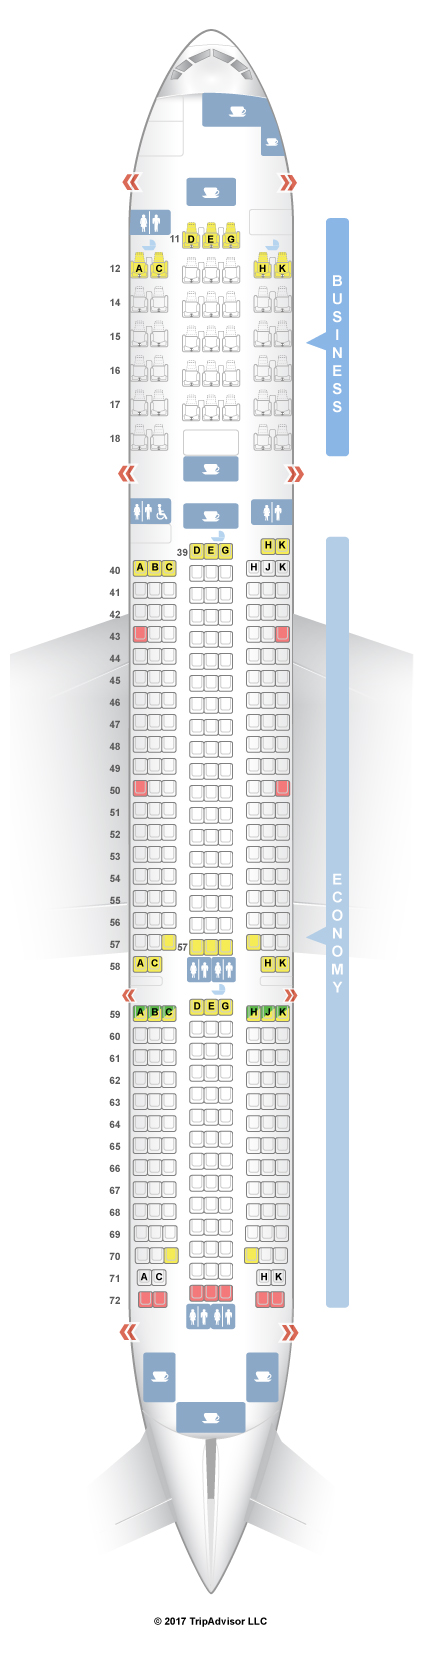 777 300er seat map cathay pacific Seatguru Seat Map Cathay Pacific Seatguru 777 300er seat map cathay pacific